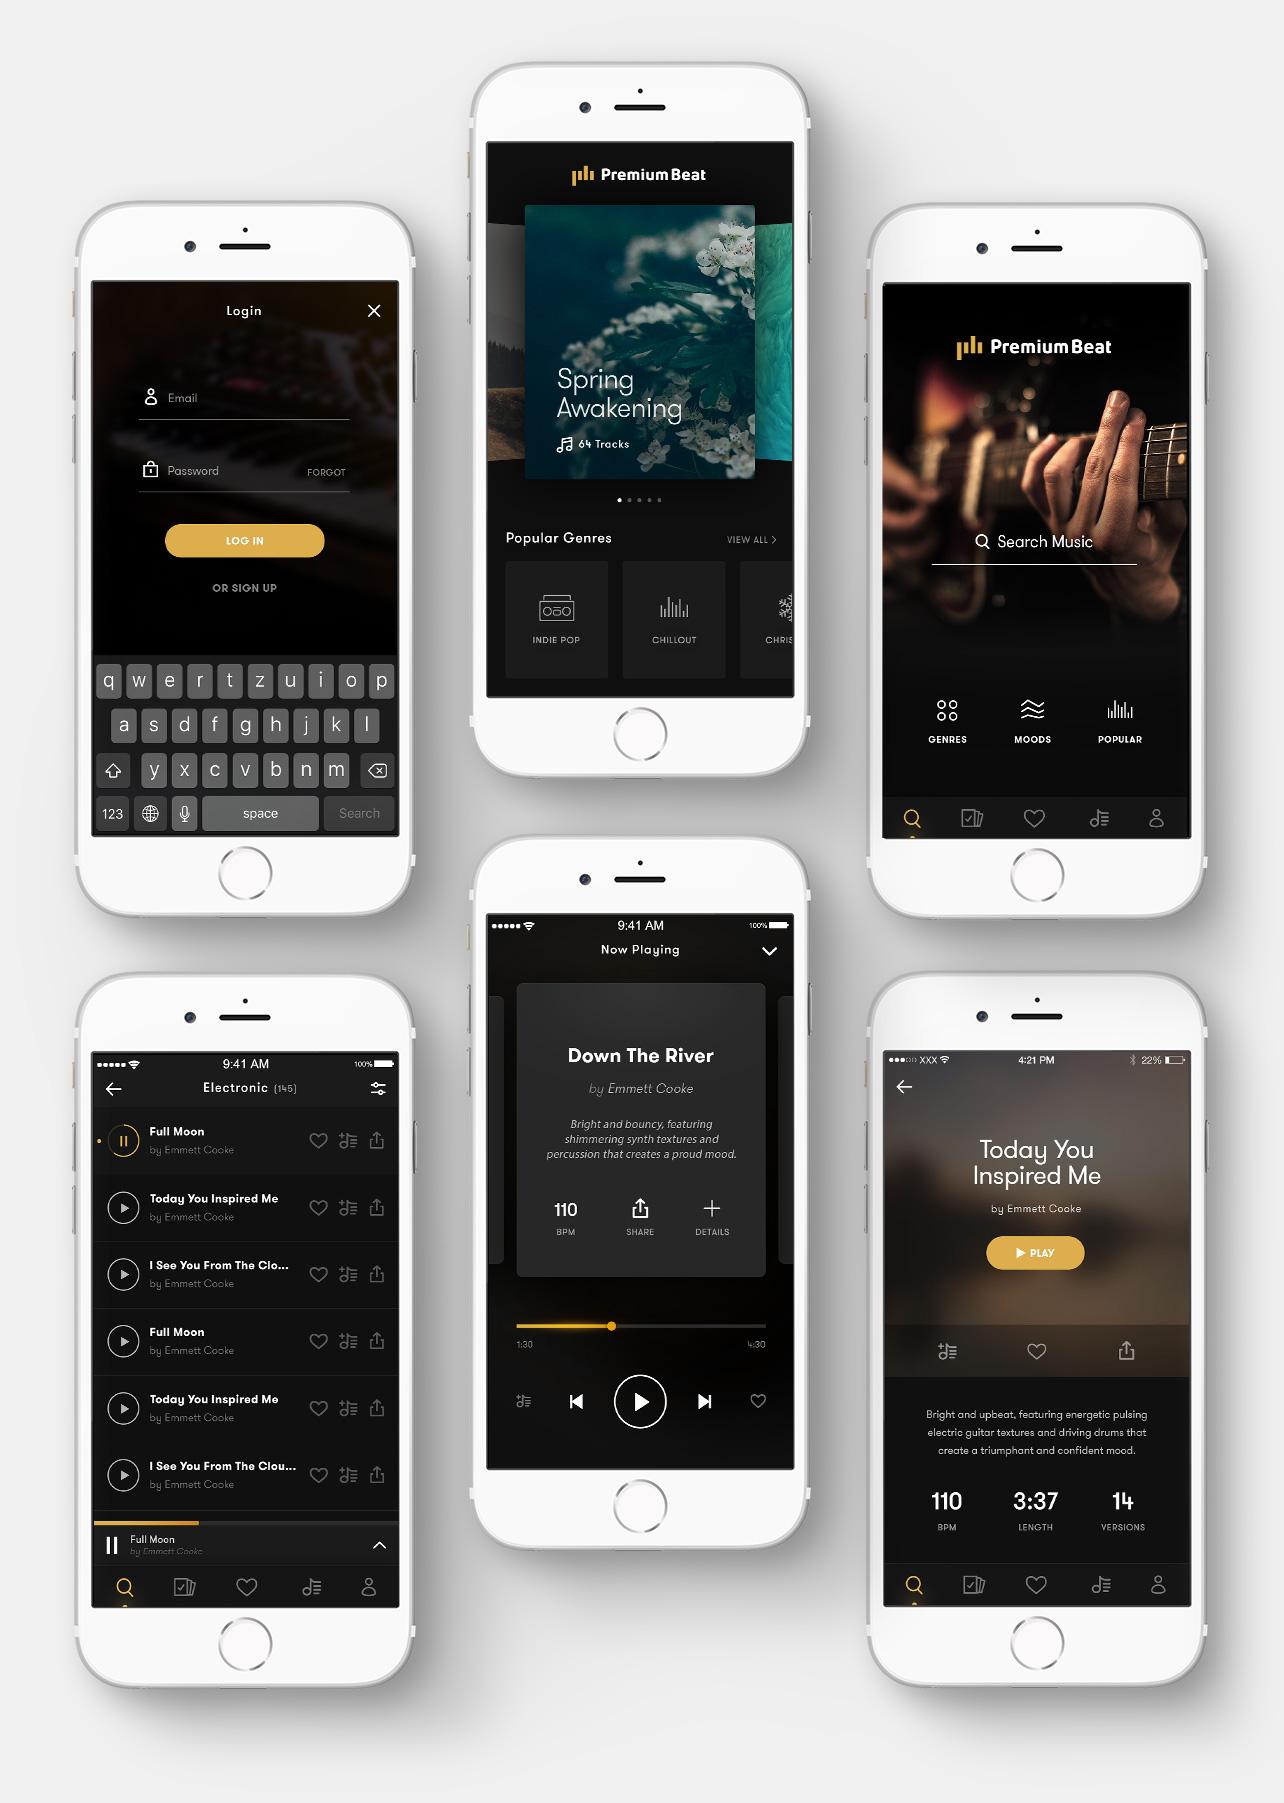 pb-app-6whiteIphones